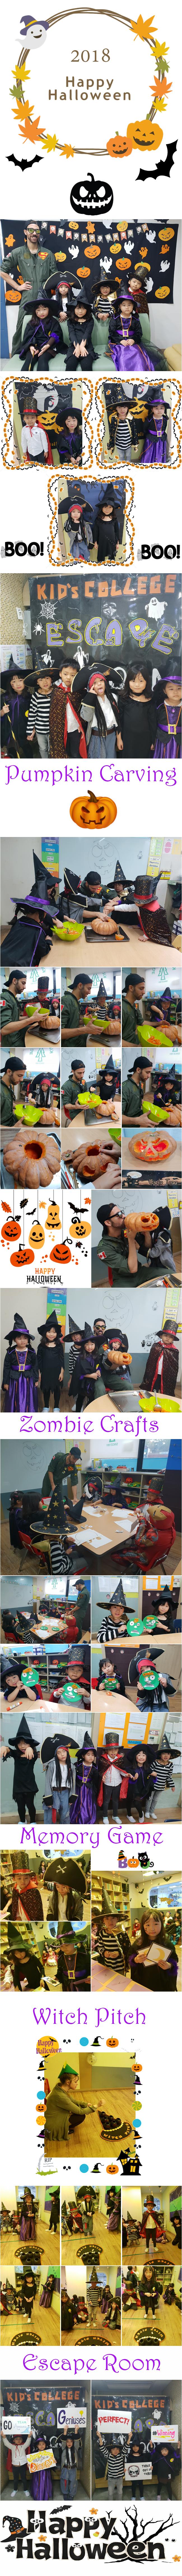 2018_Halloween_Kinder copy.jpg